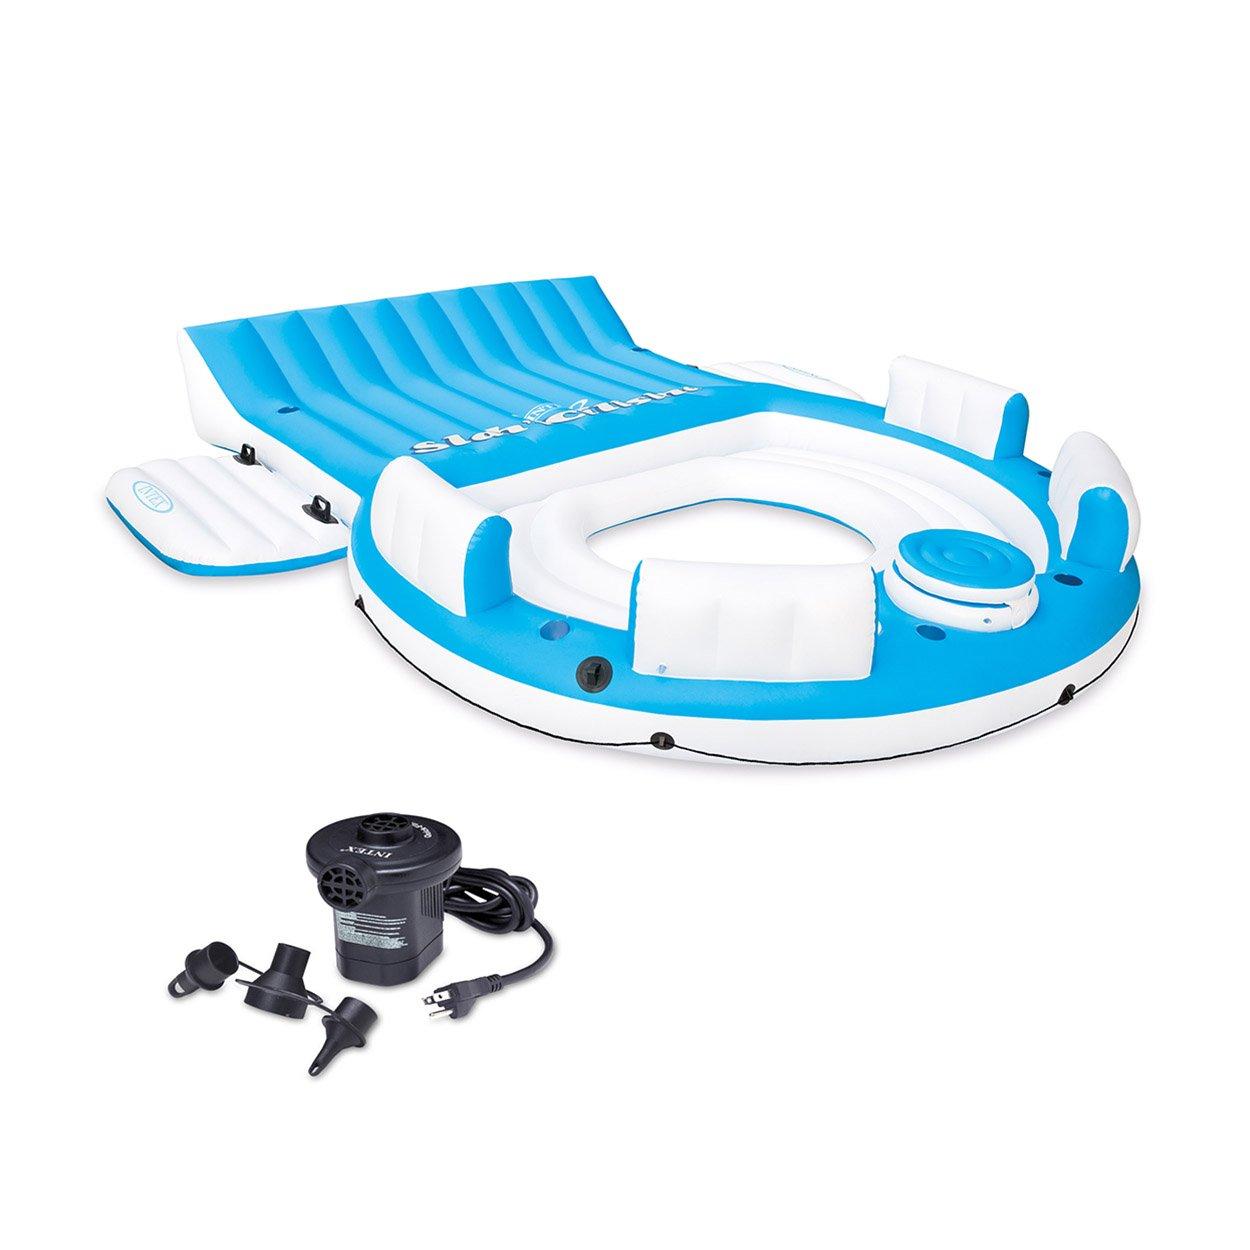 Intex Relaxation Island Raft And Intex AC Electric Air Pump | 56299CA + 66619E by Intex